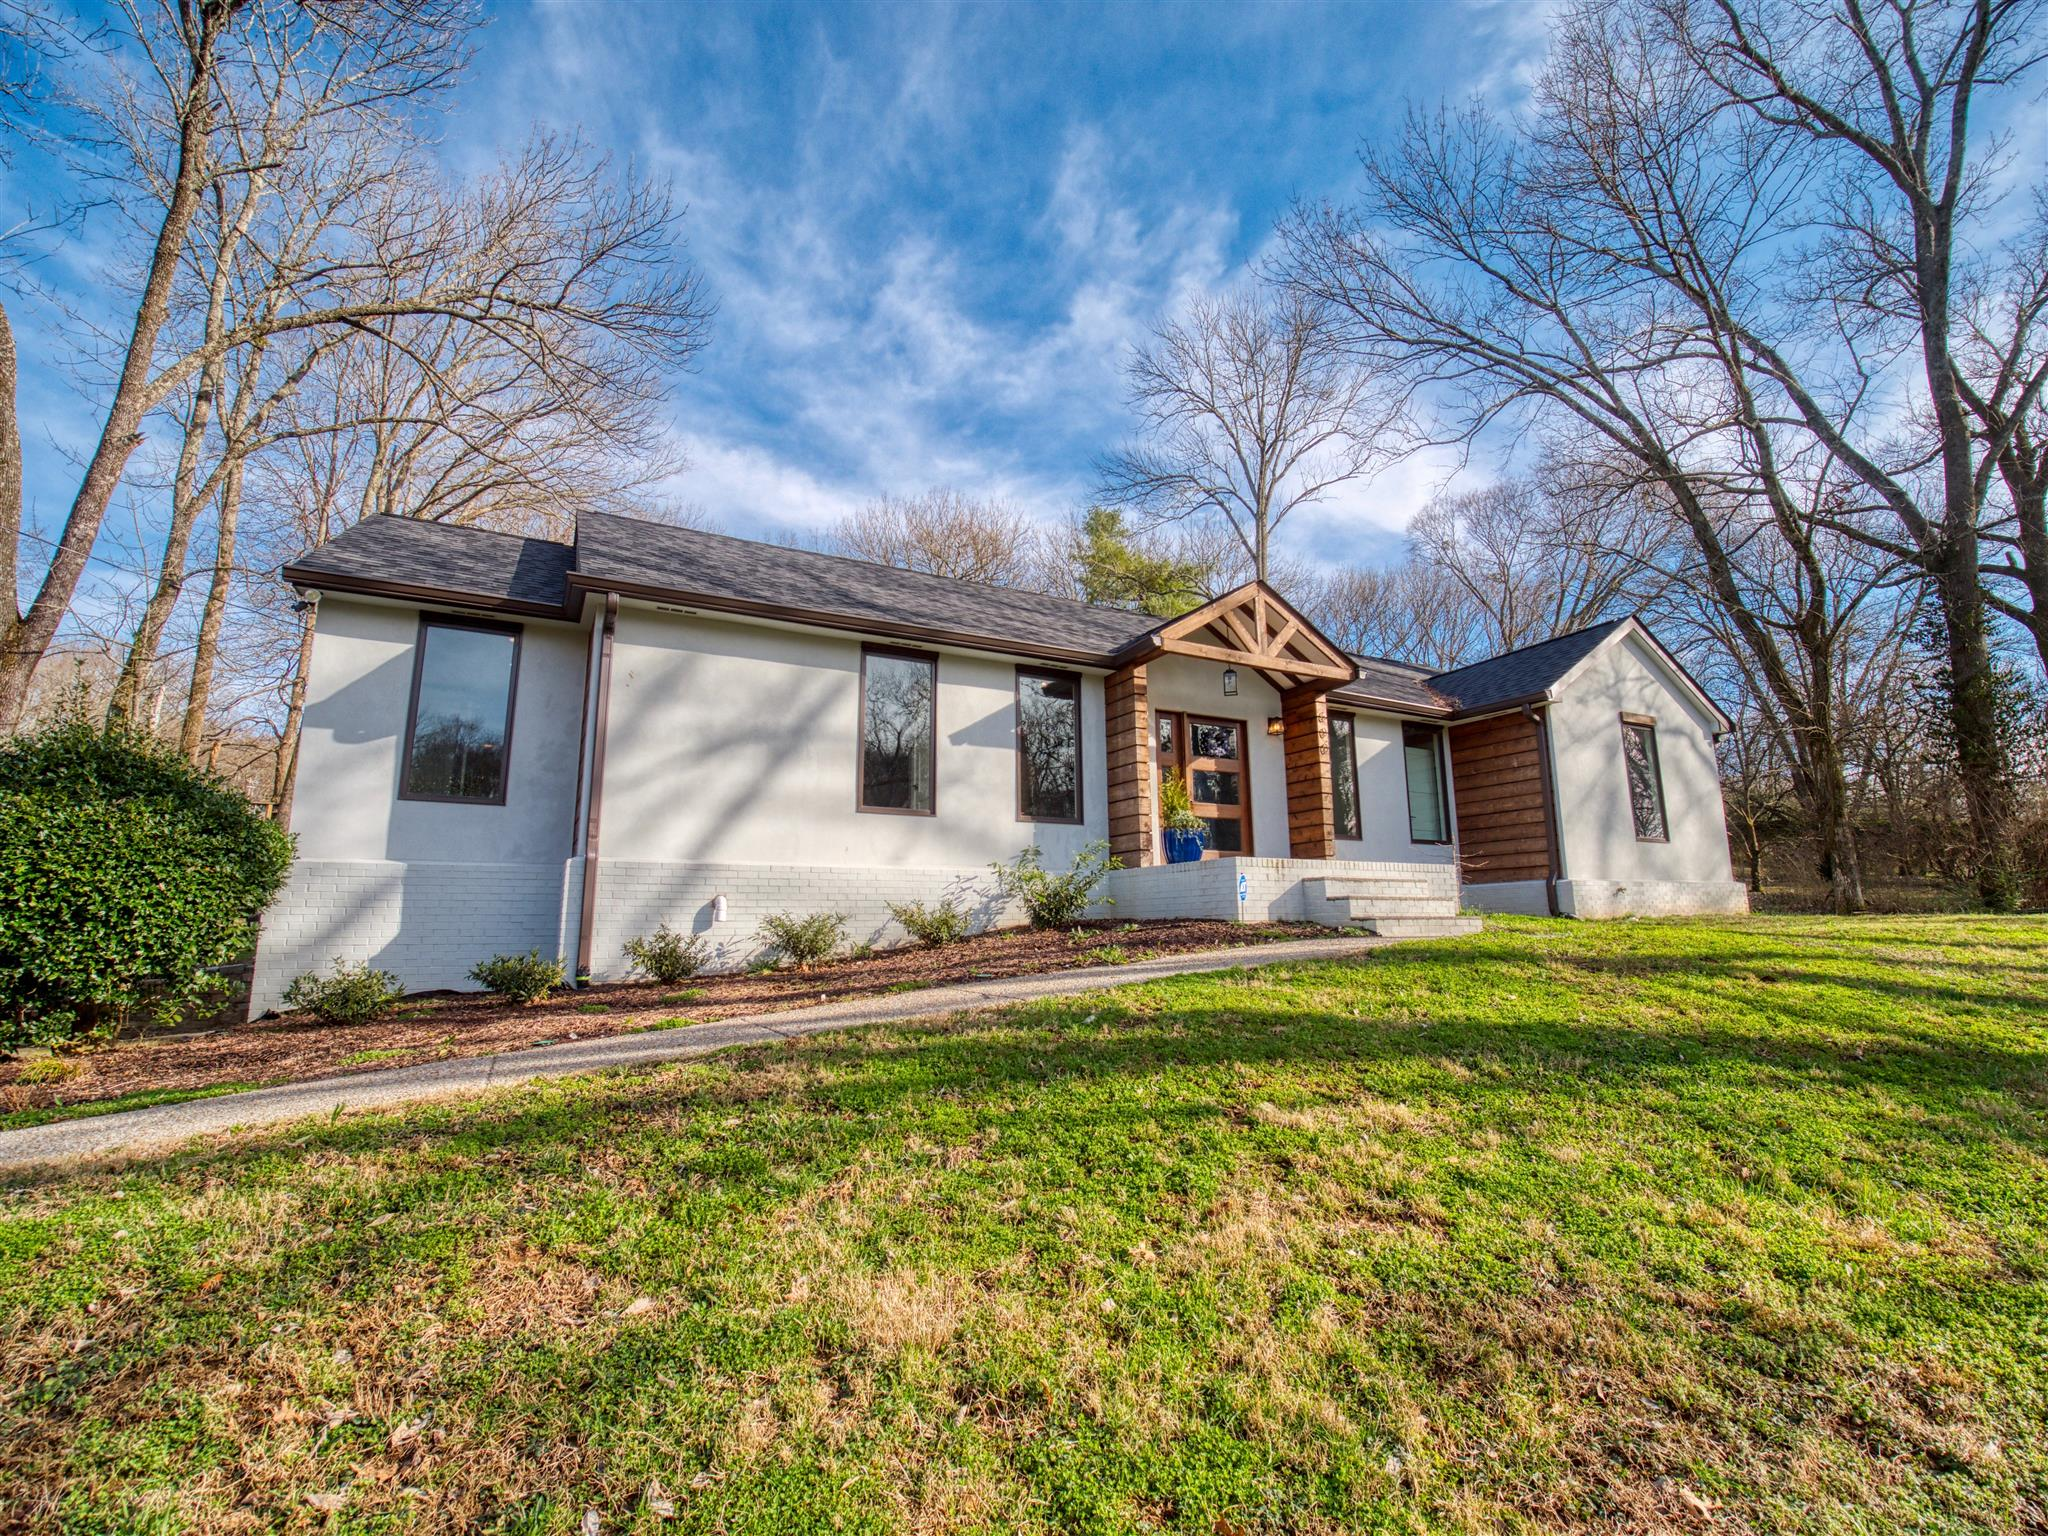 600 Lynnwood Blvd, Belle Meade, Tennessee